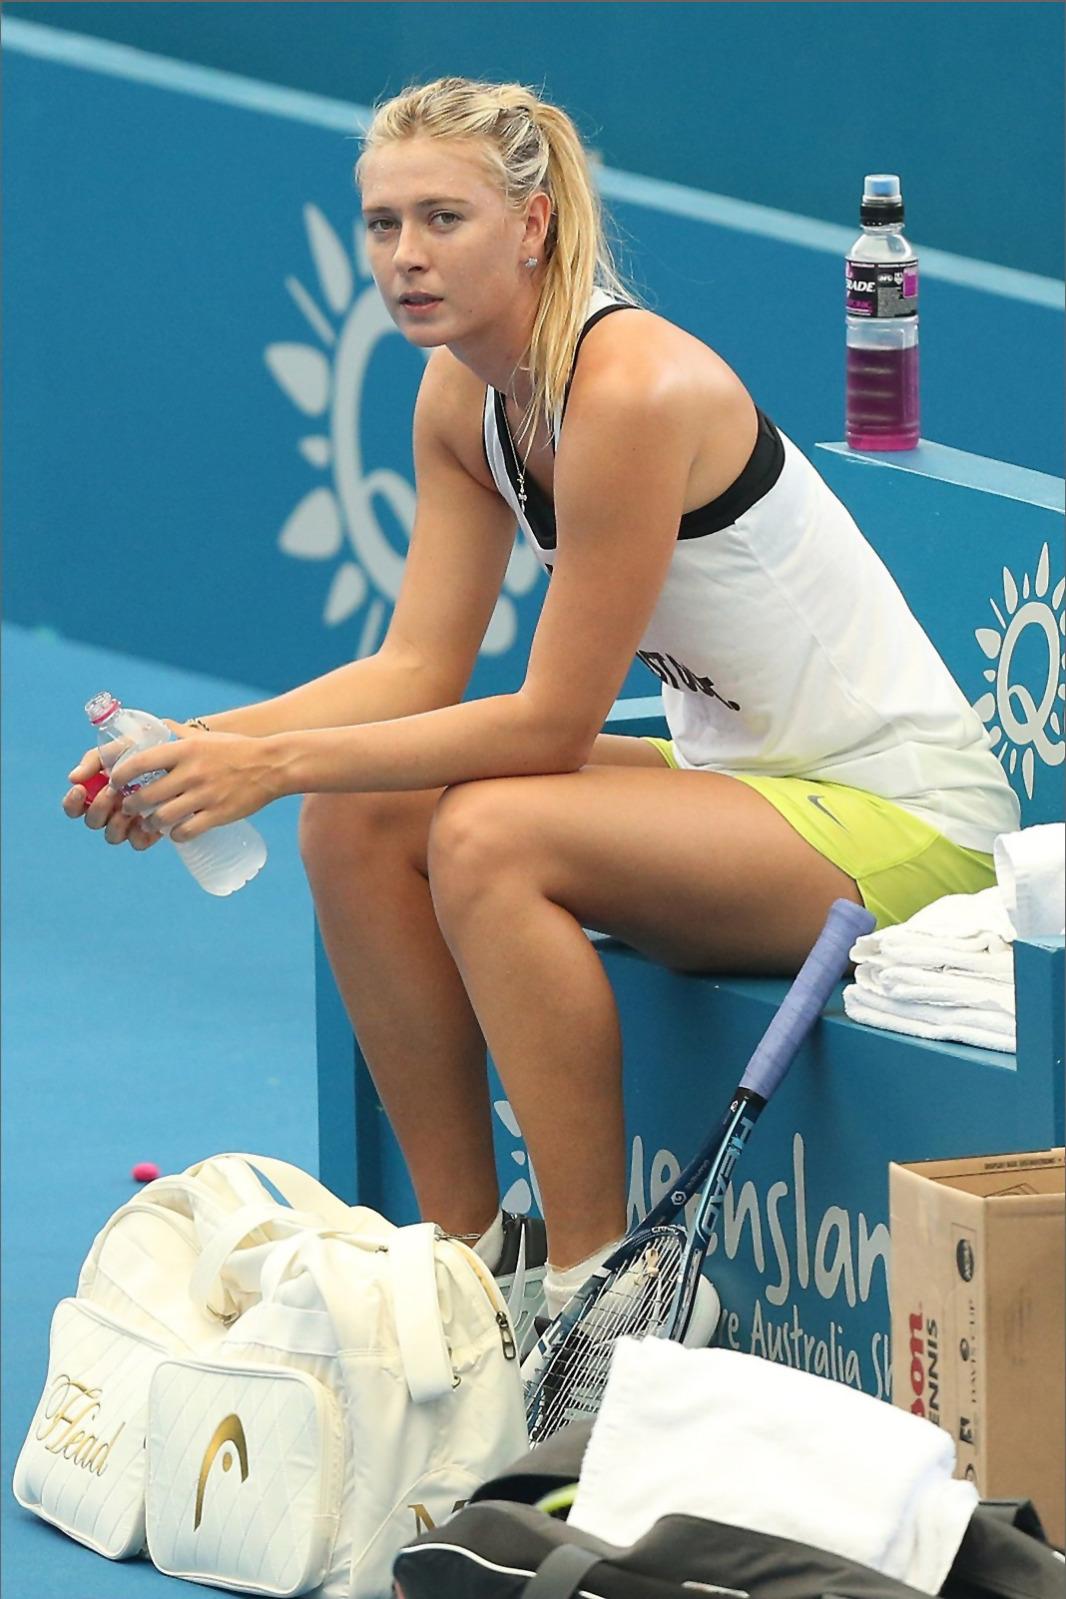 http://2.bp.blogspot.com/-BnT6hdCuqaM/UR4bz1HuTGI/AAAAAAAADW0/sYMwfg5YUBo/s1600/Maria+Sharapova+New+Picture+2013+04.jpg